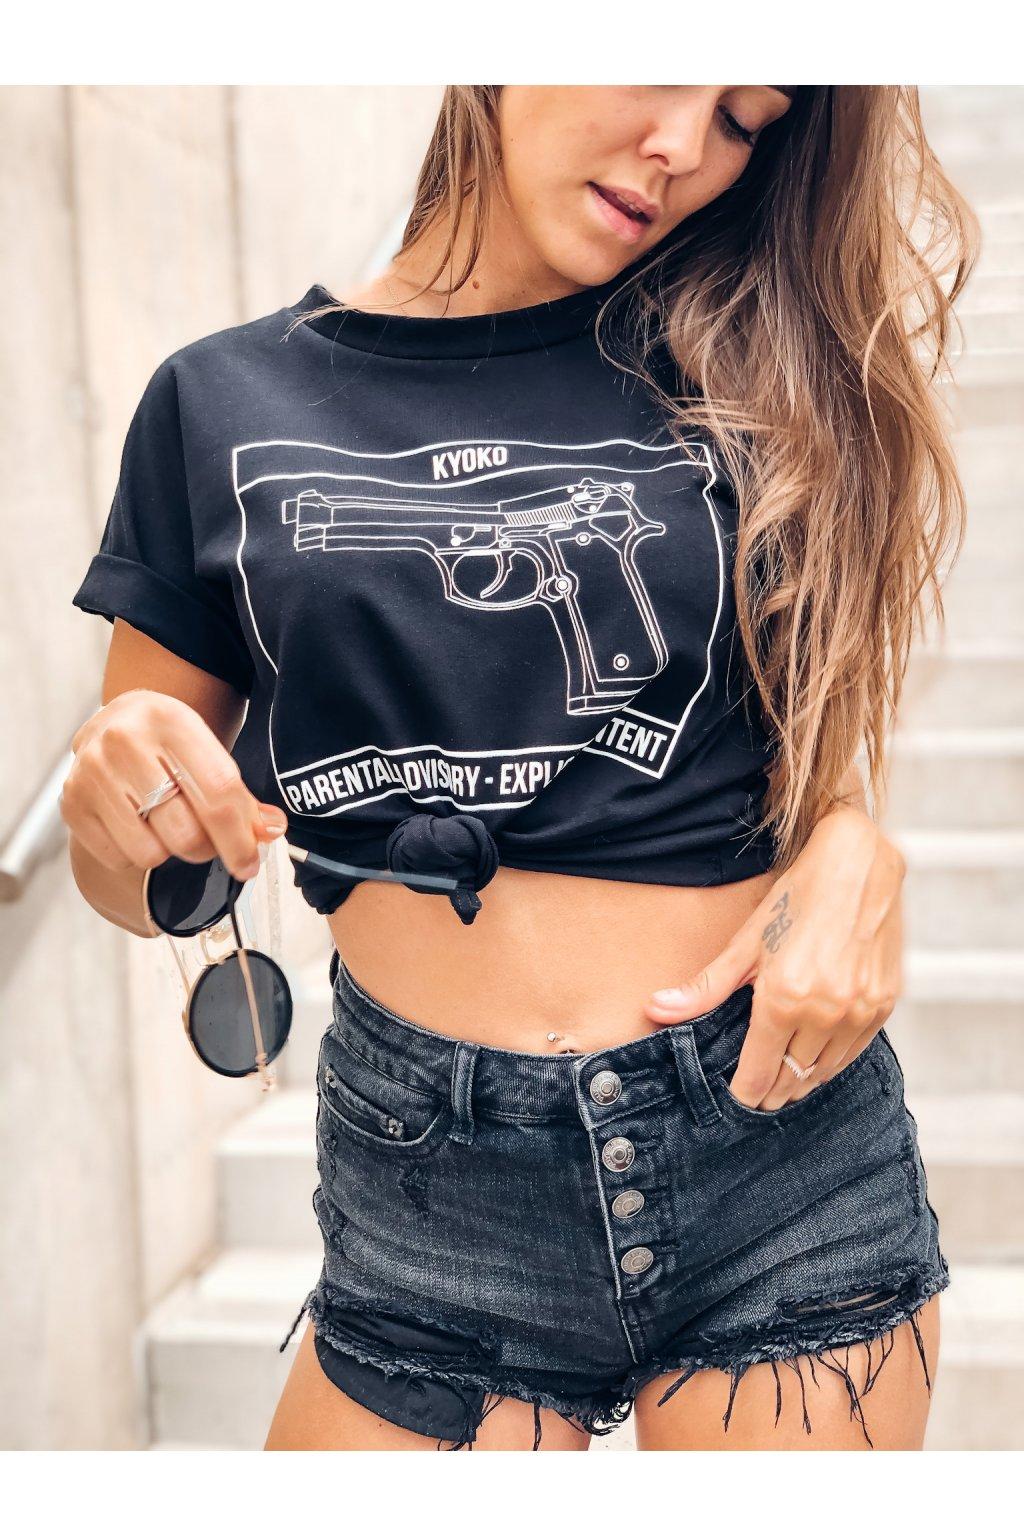 damske tricko pistol black eshopat cz 2